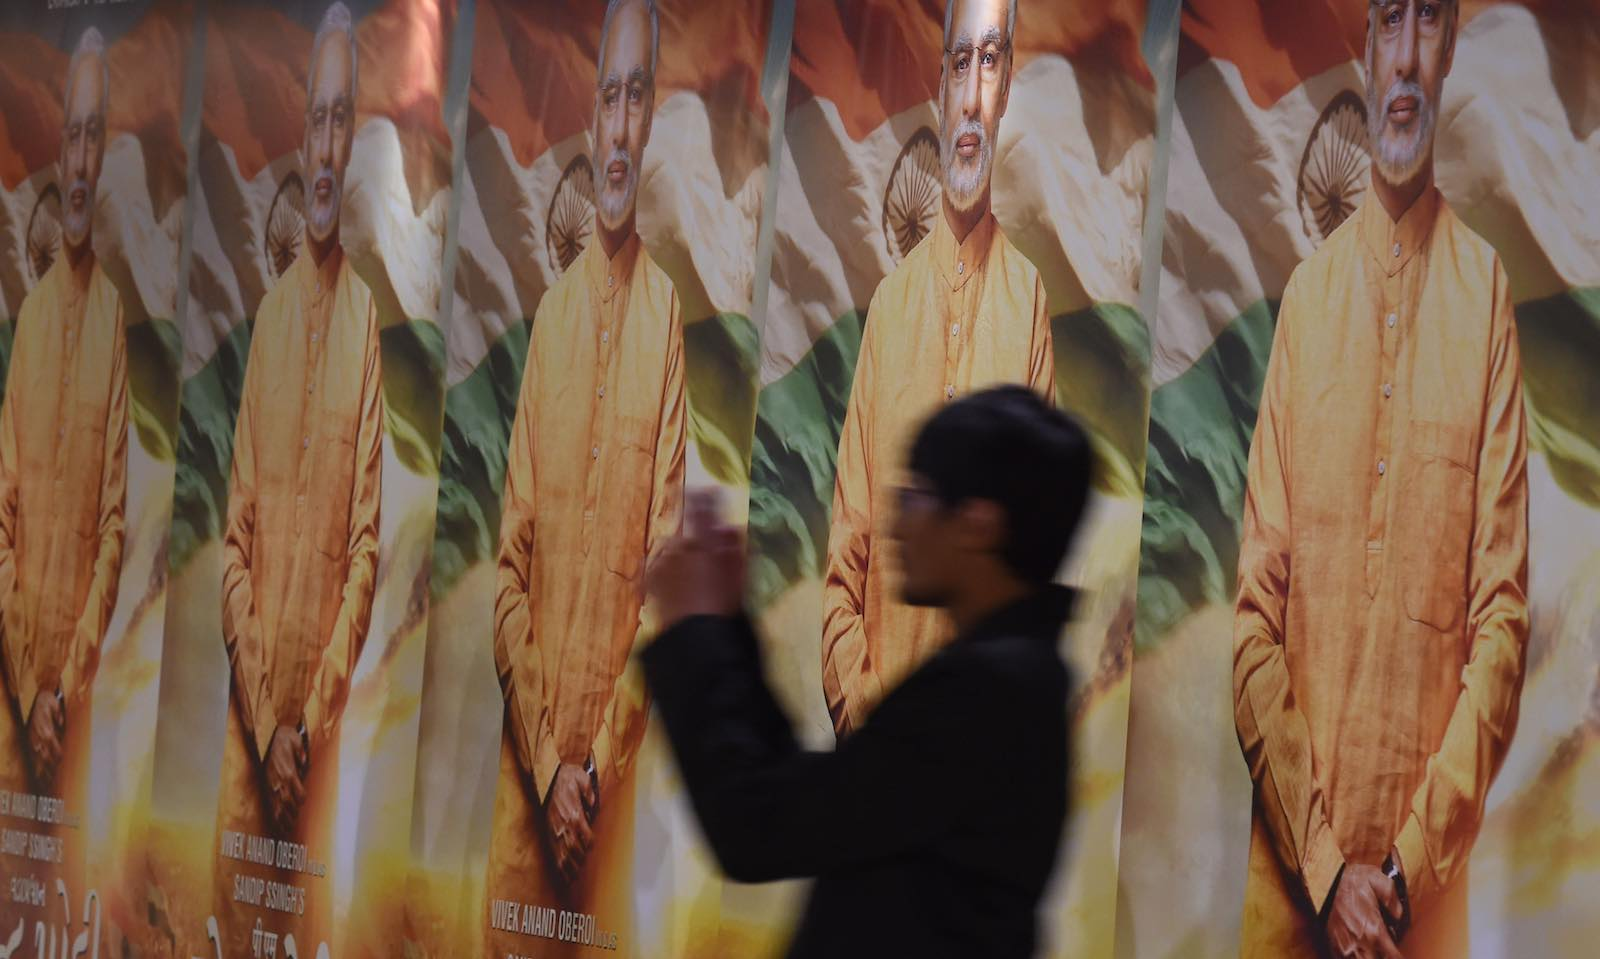 Poster displays for the forthcoming Modi biopic (Photo: Indranil Mukherjee via Getty)